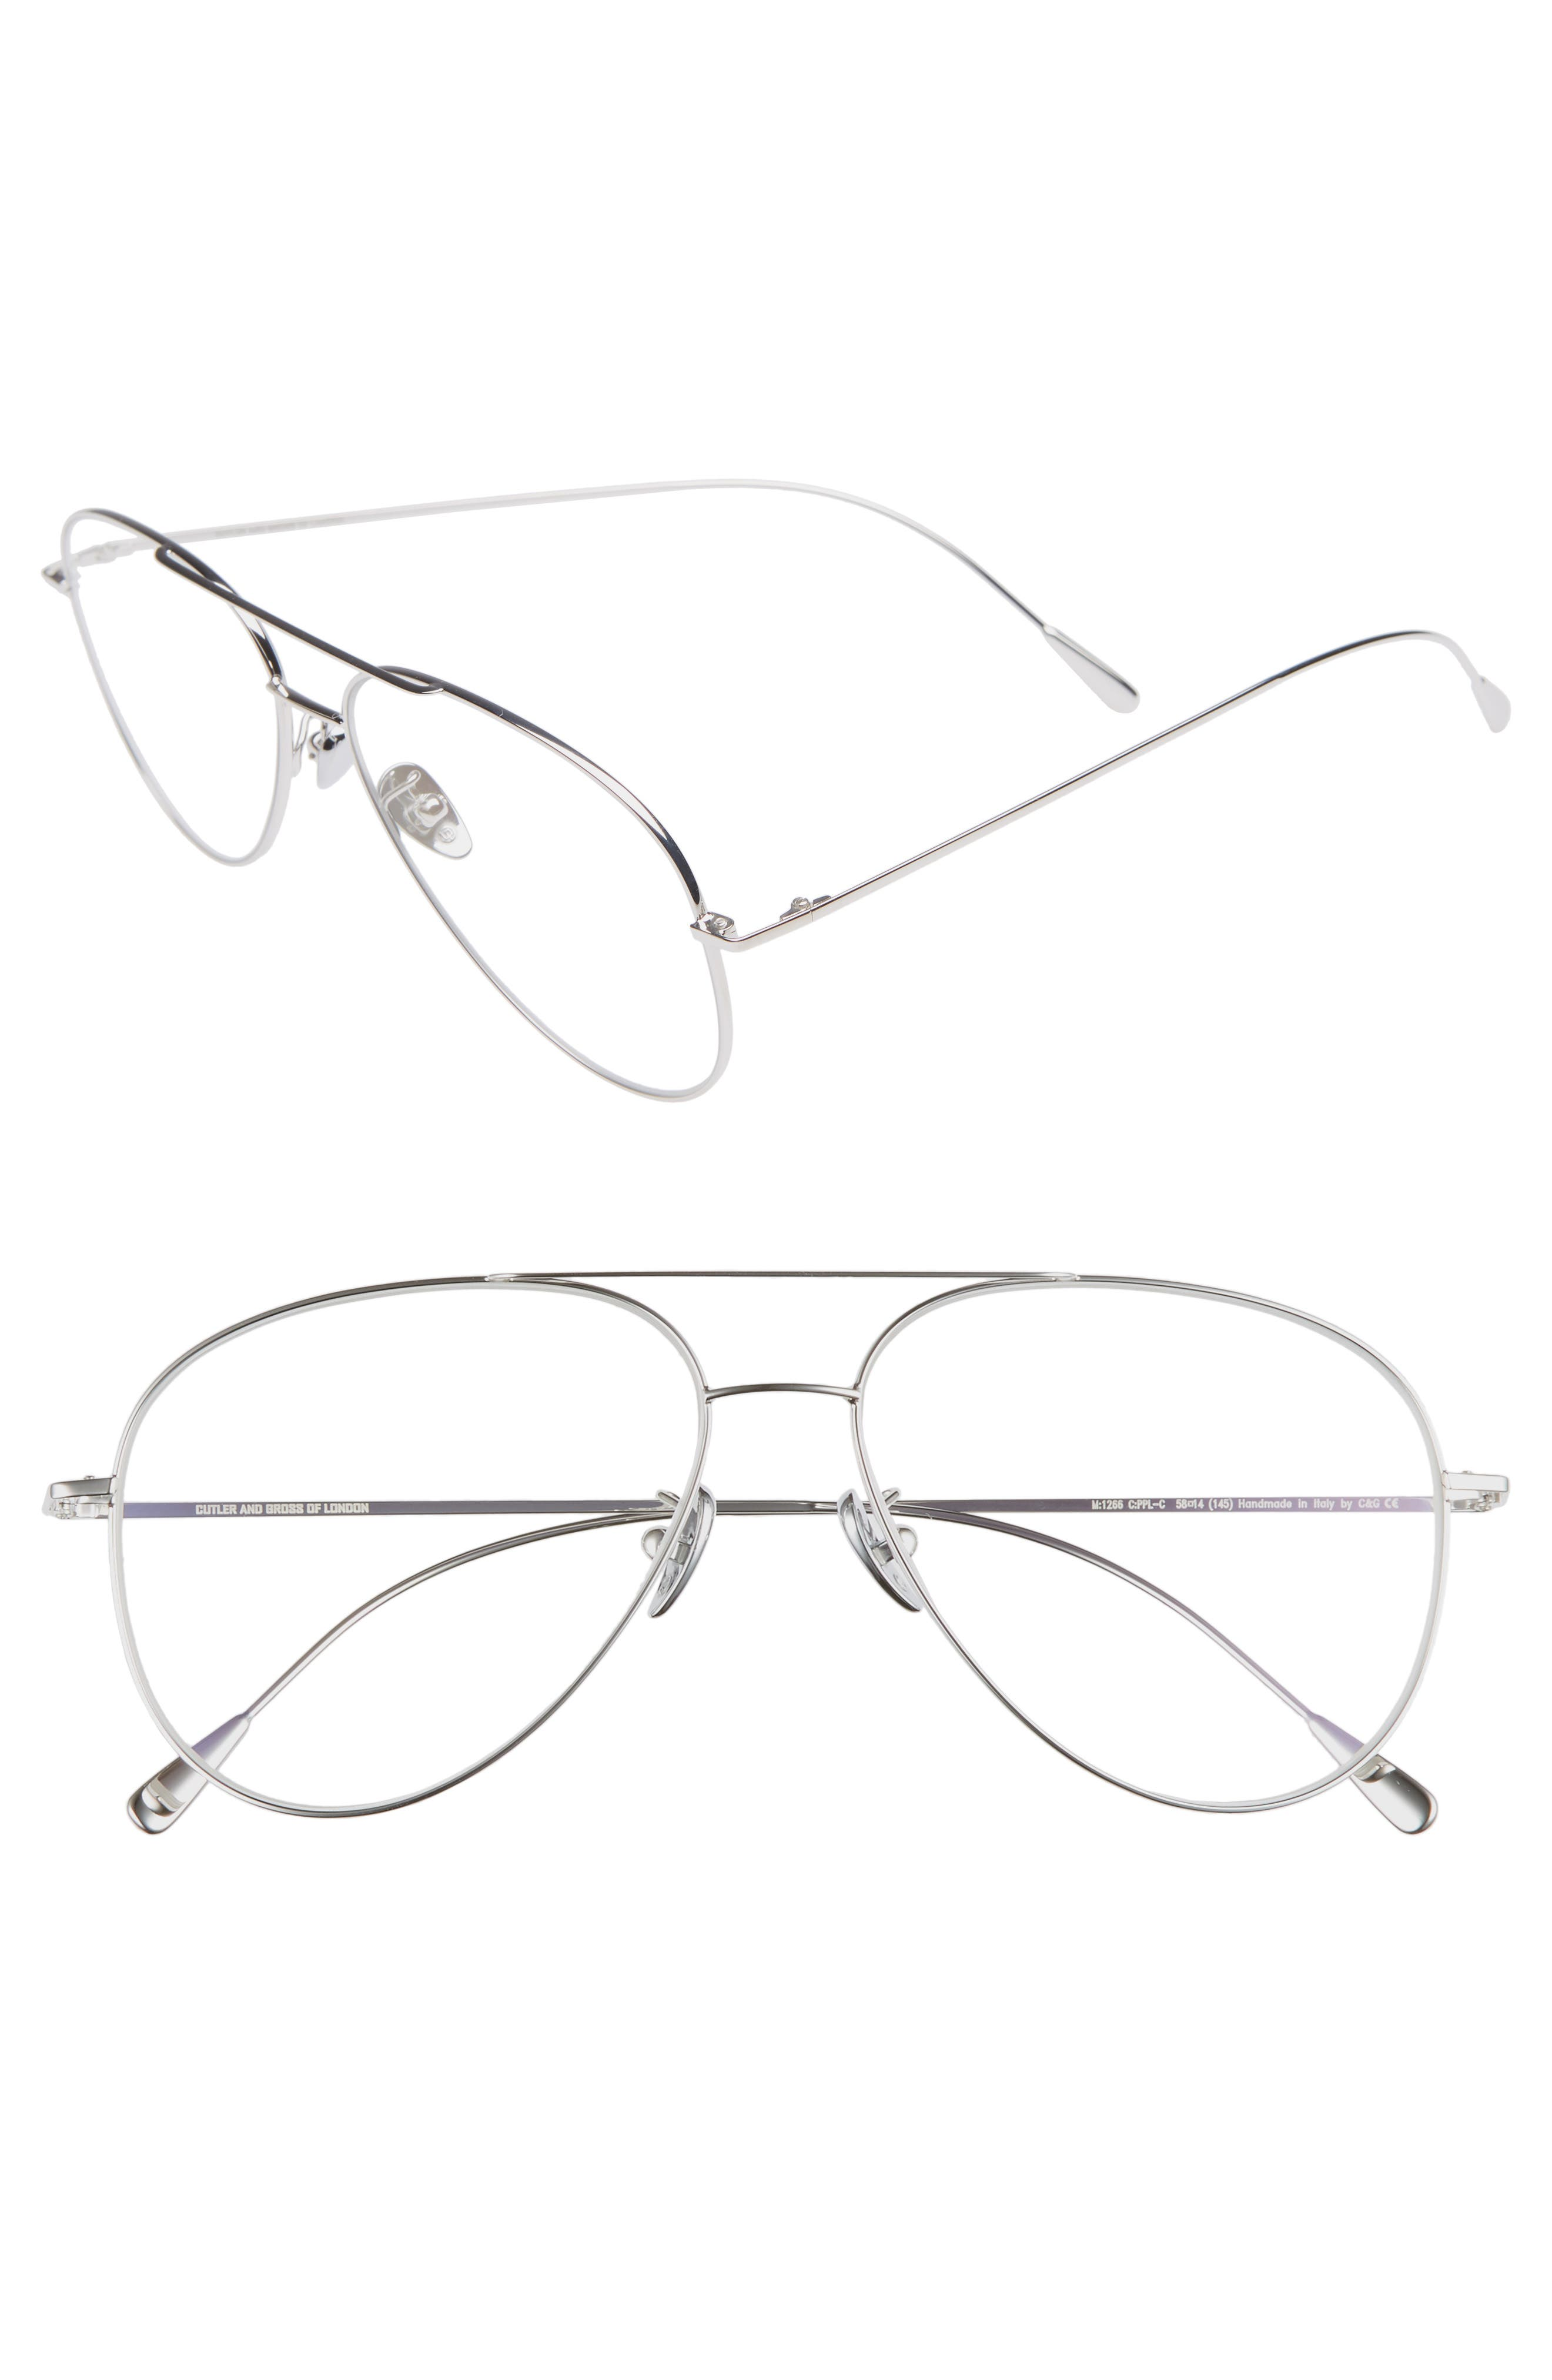 58mm Polarized Aviator Optical Glasses,                             Main thumbnail 1, color,                             PALLADIUM